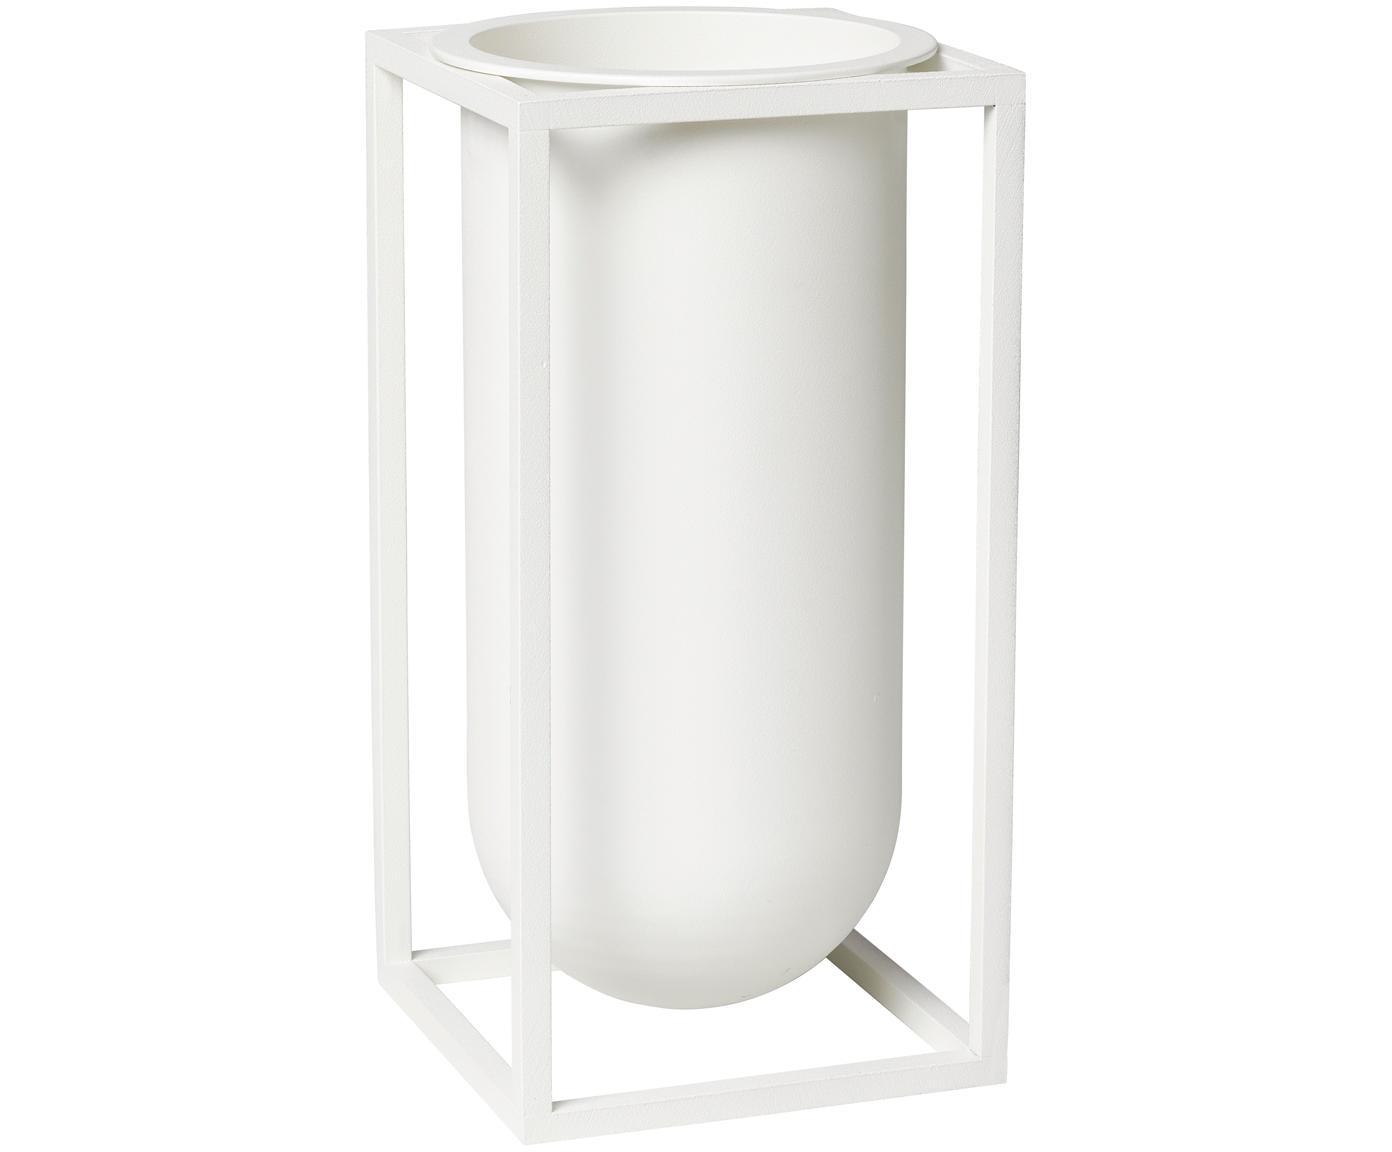 Handgefertigte Vase Kubus aus Aluminium, Aluminium, lackiert, Weiss, 10 x 20 cm